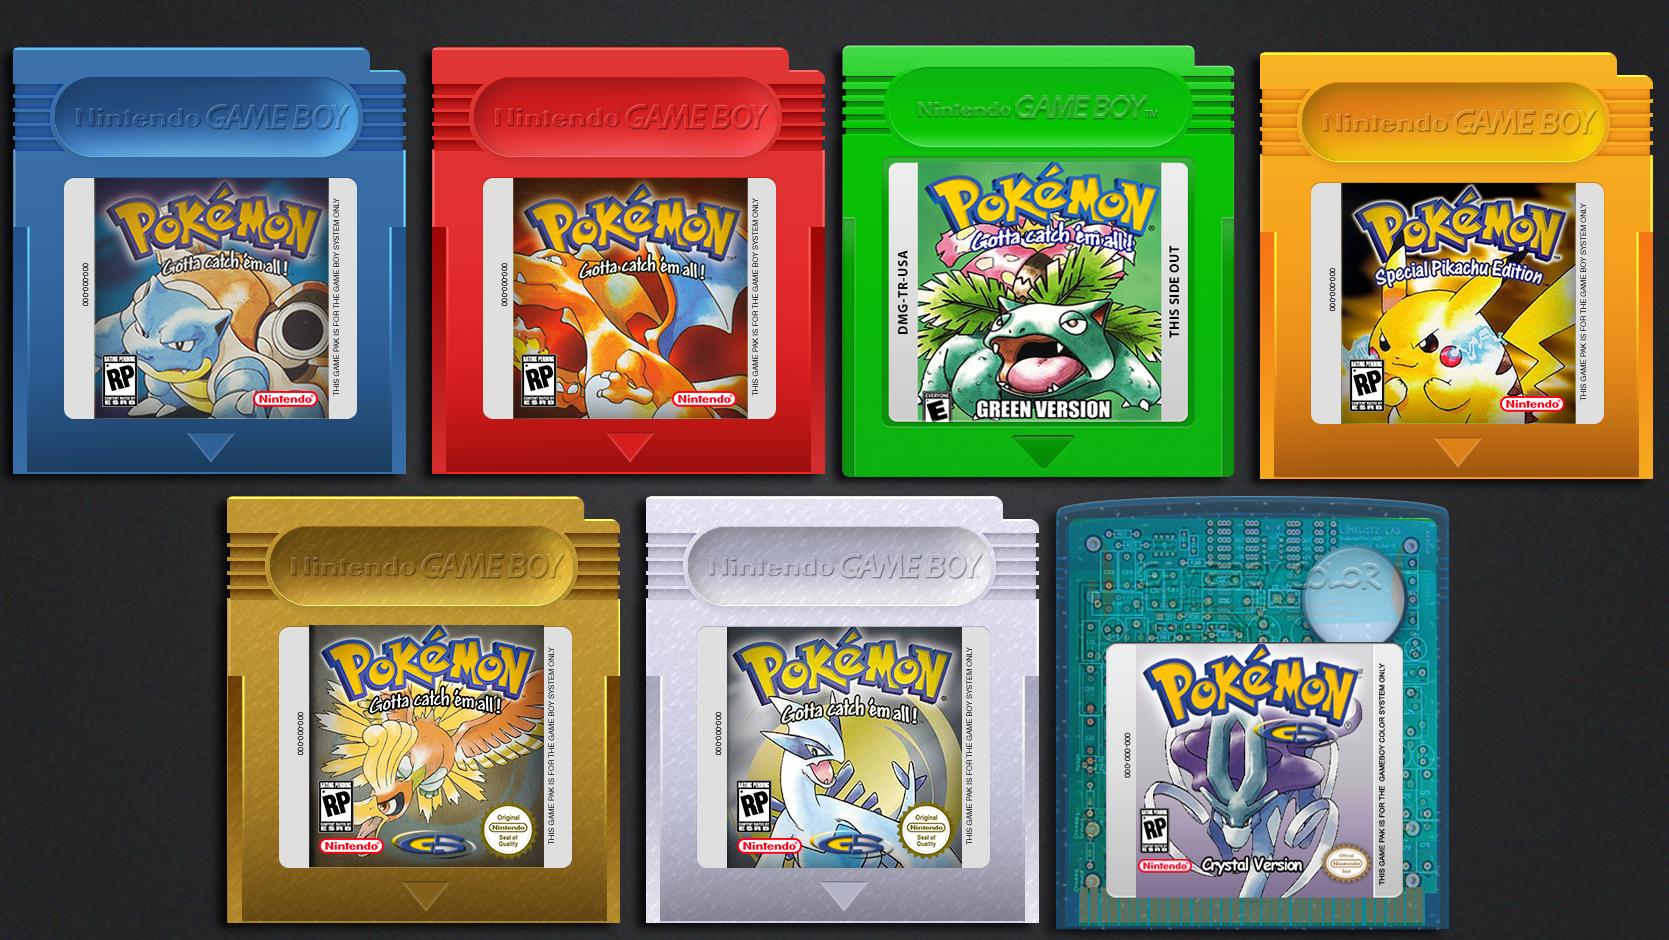 Pokemon games for gameboy color - Pokemon Games By Vitalovitalo Pokemon Games By Vitalovitalo